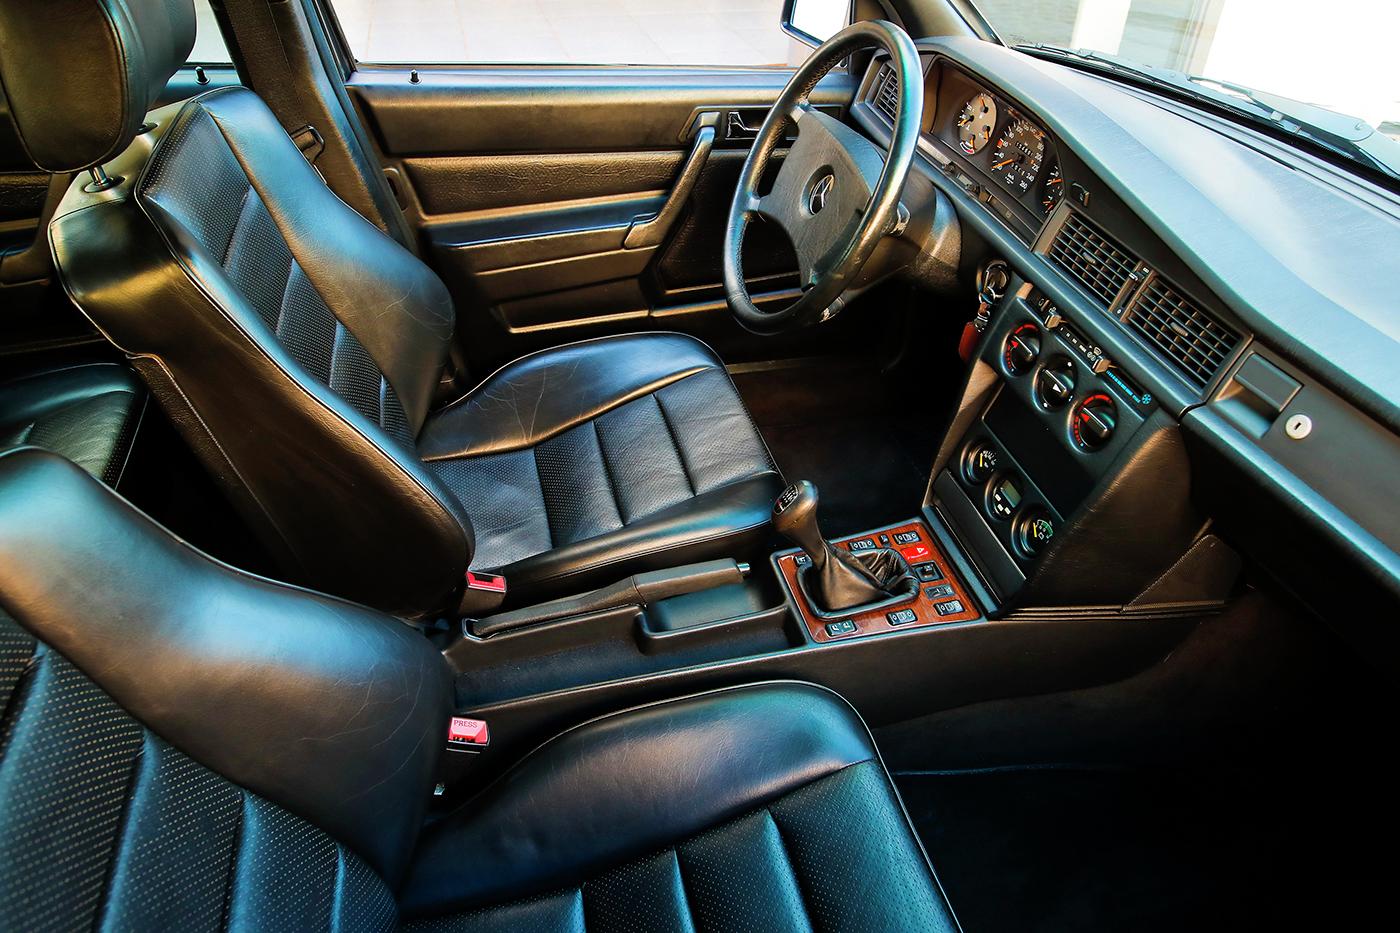 1990_Mercedes-Benz_190E_2.5-16_Evolution_II_0021